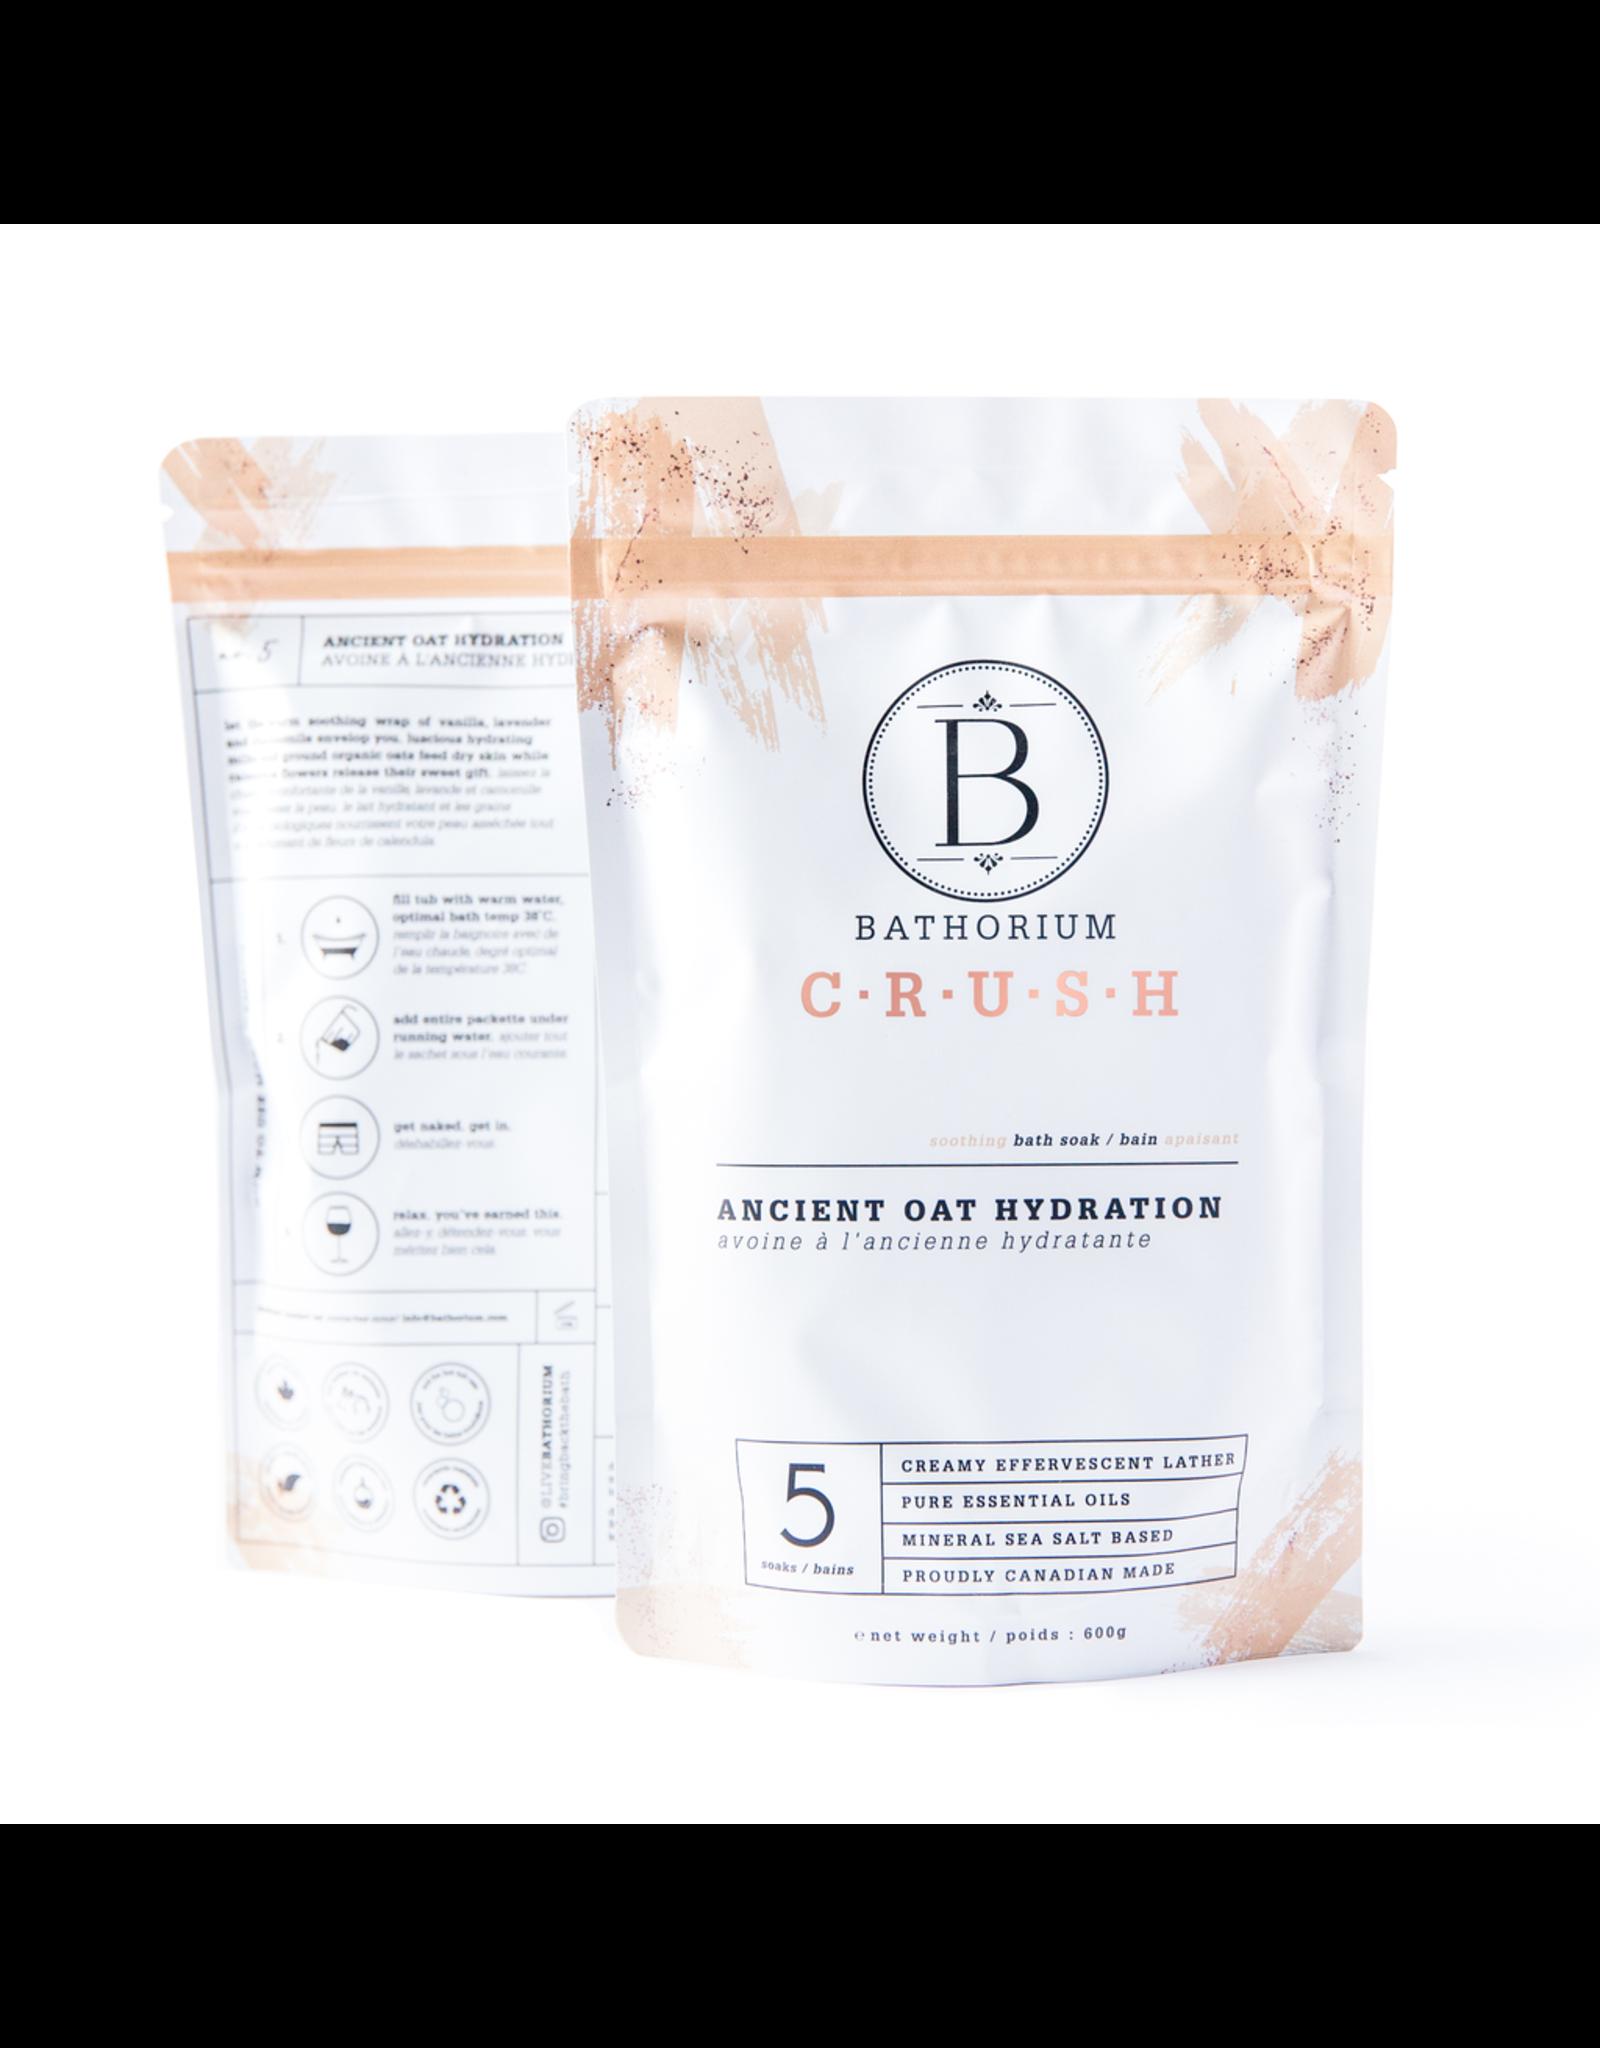 BATHORIUM Ancient Oat Hydration - CRUSH (600 g)